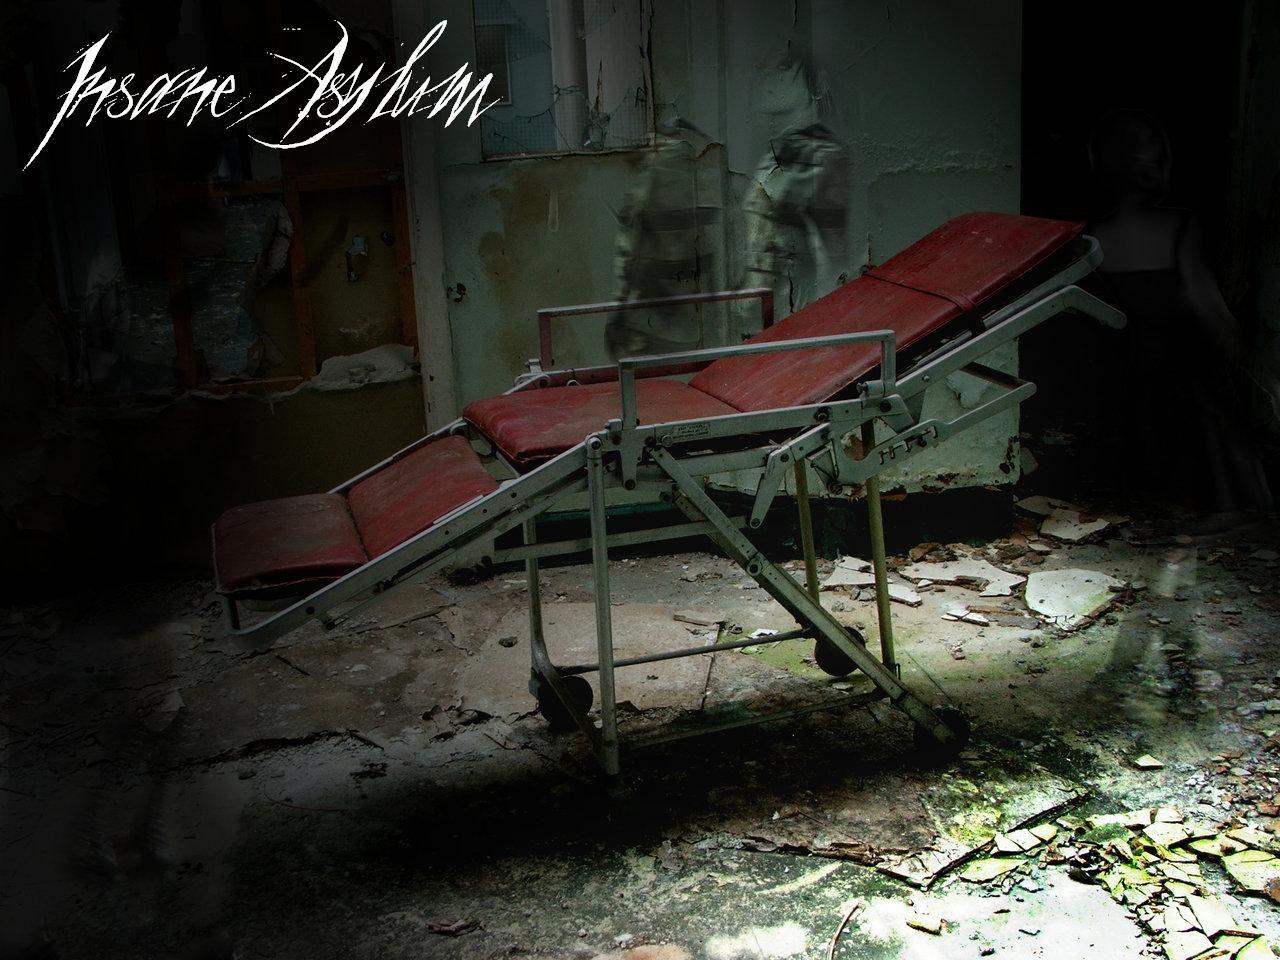 Insane asylum research paper?